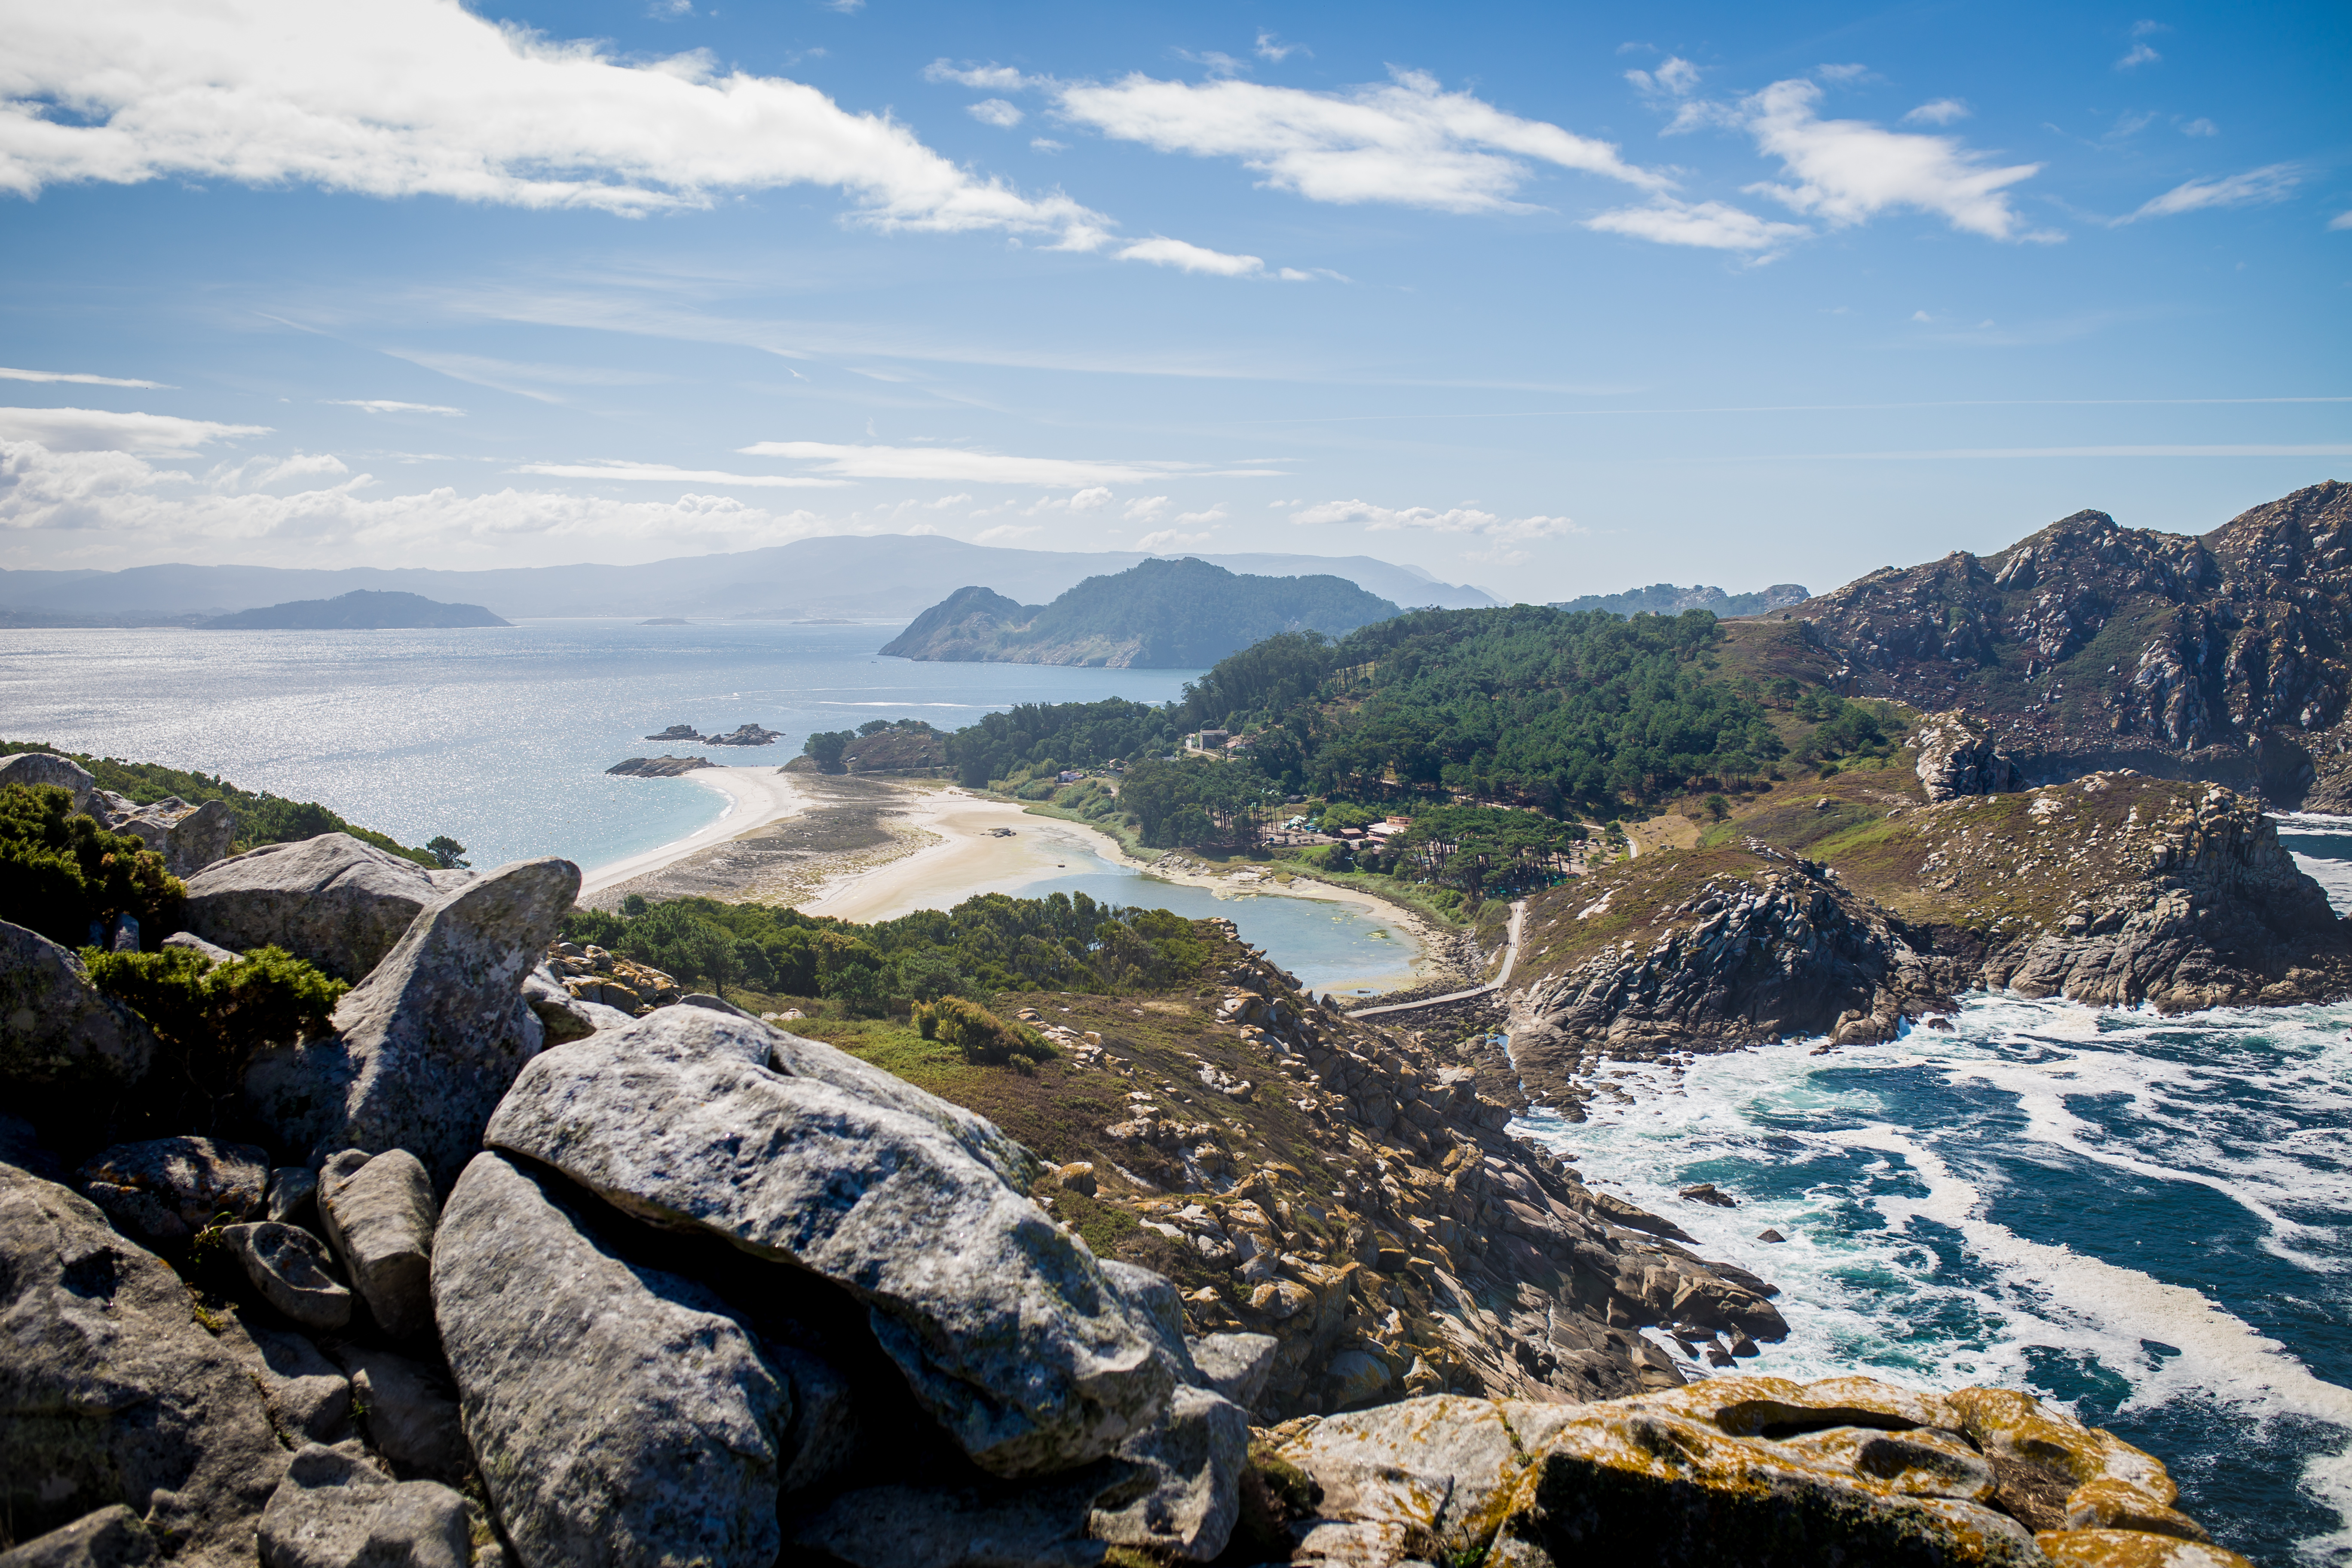 Mirador Alto Do Príncipe, Islas Cíes, Galicia